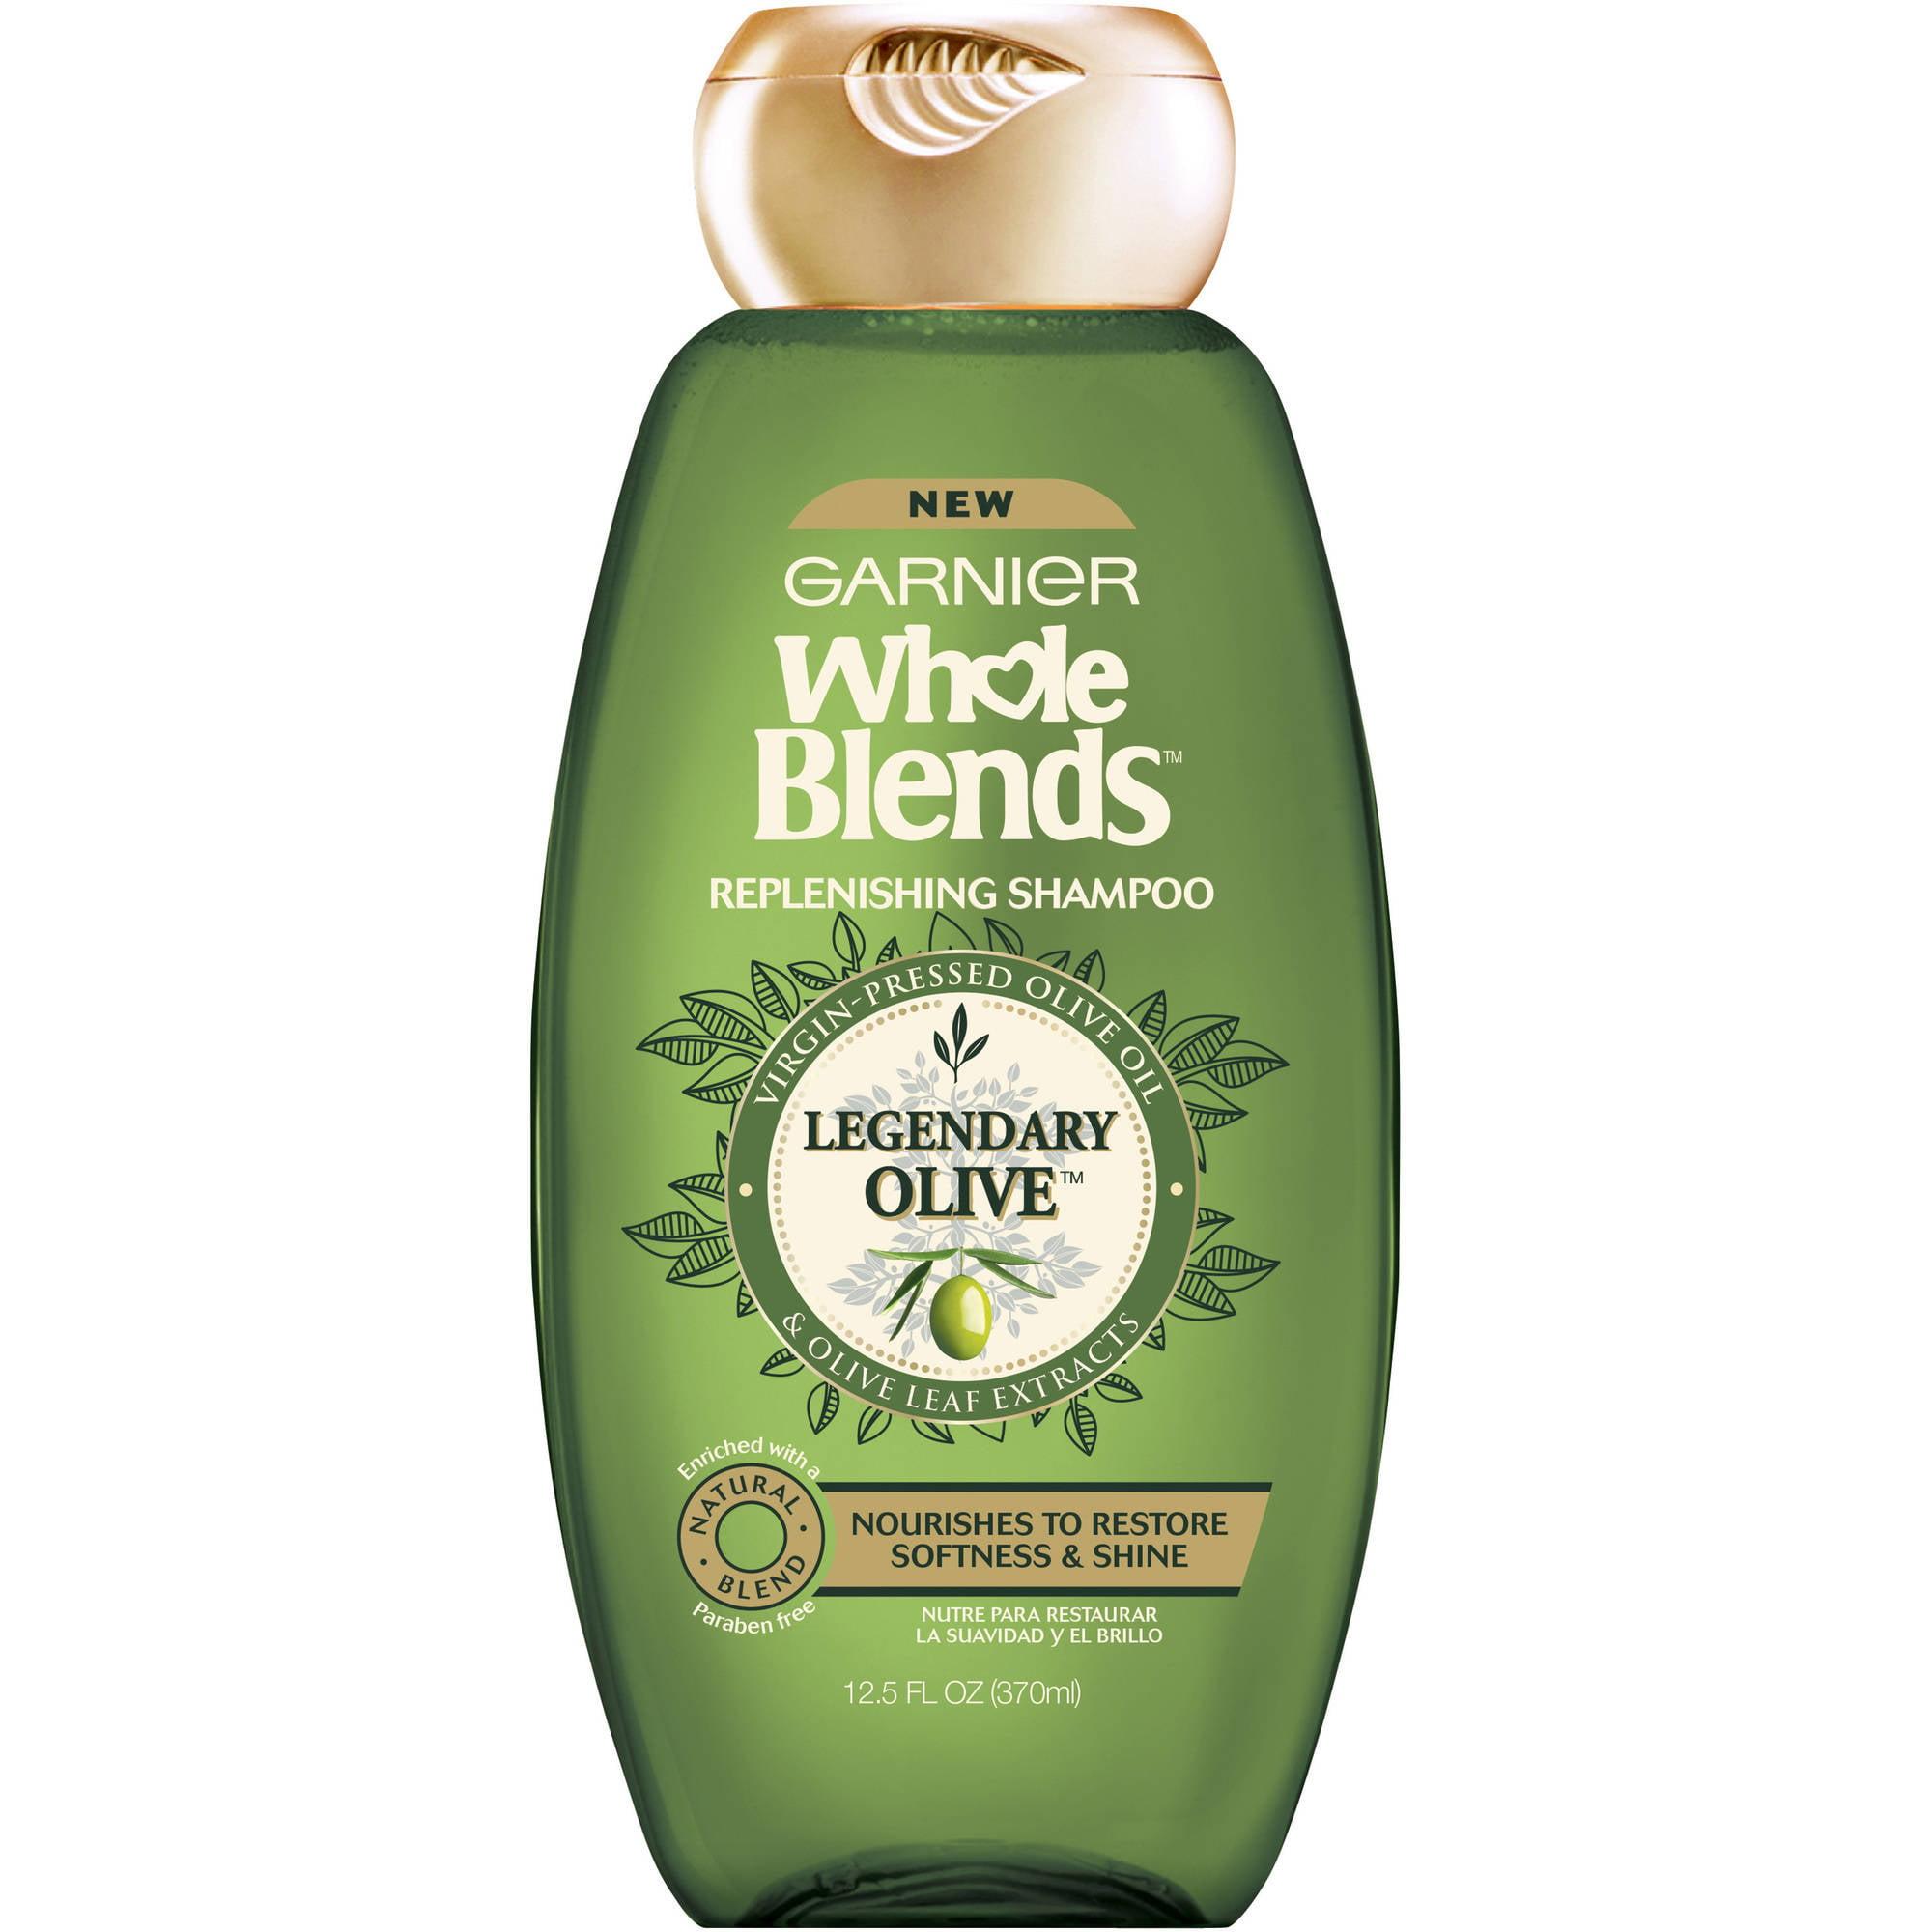 Garnier Whole Blends Replenishing Shampoo Legendary Olive 12.5 FL OZ